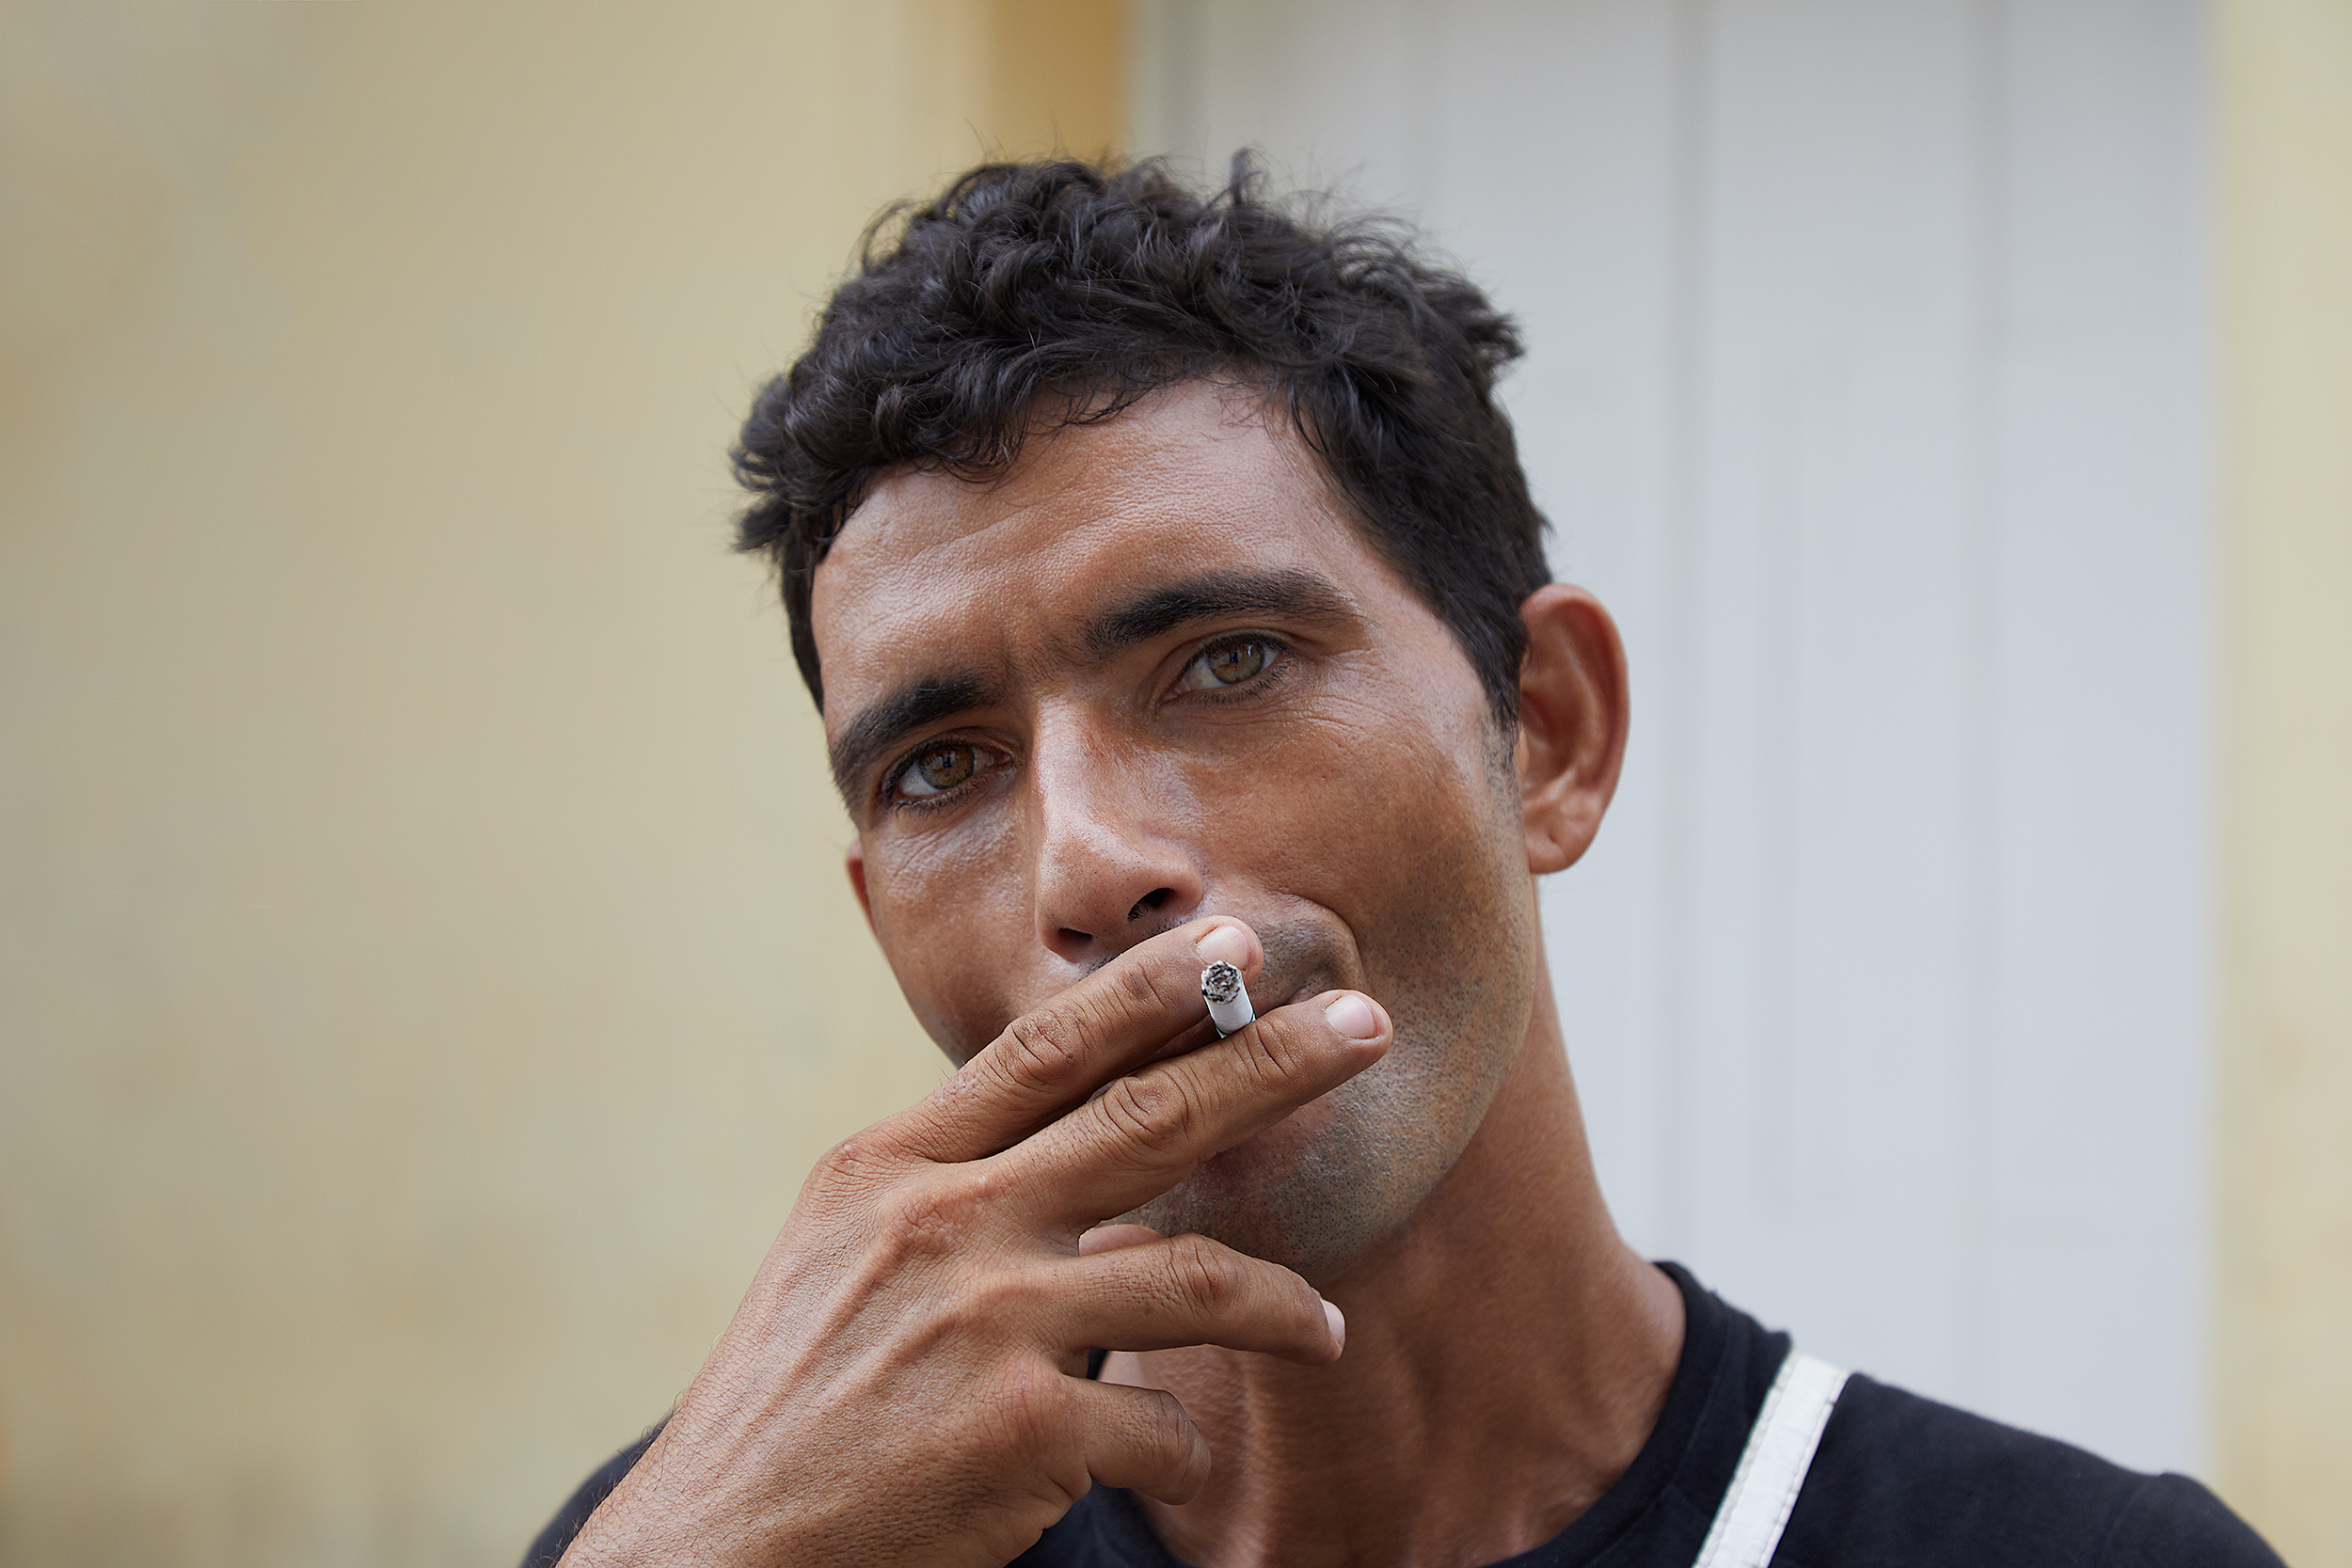 Cuban_Man_Open_Shade.jpg